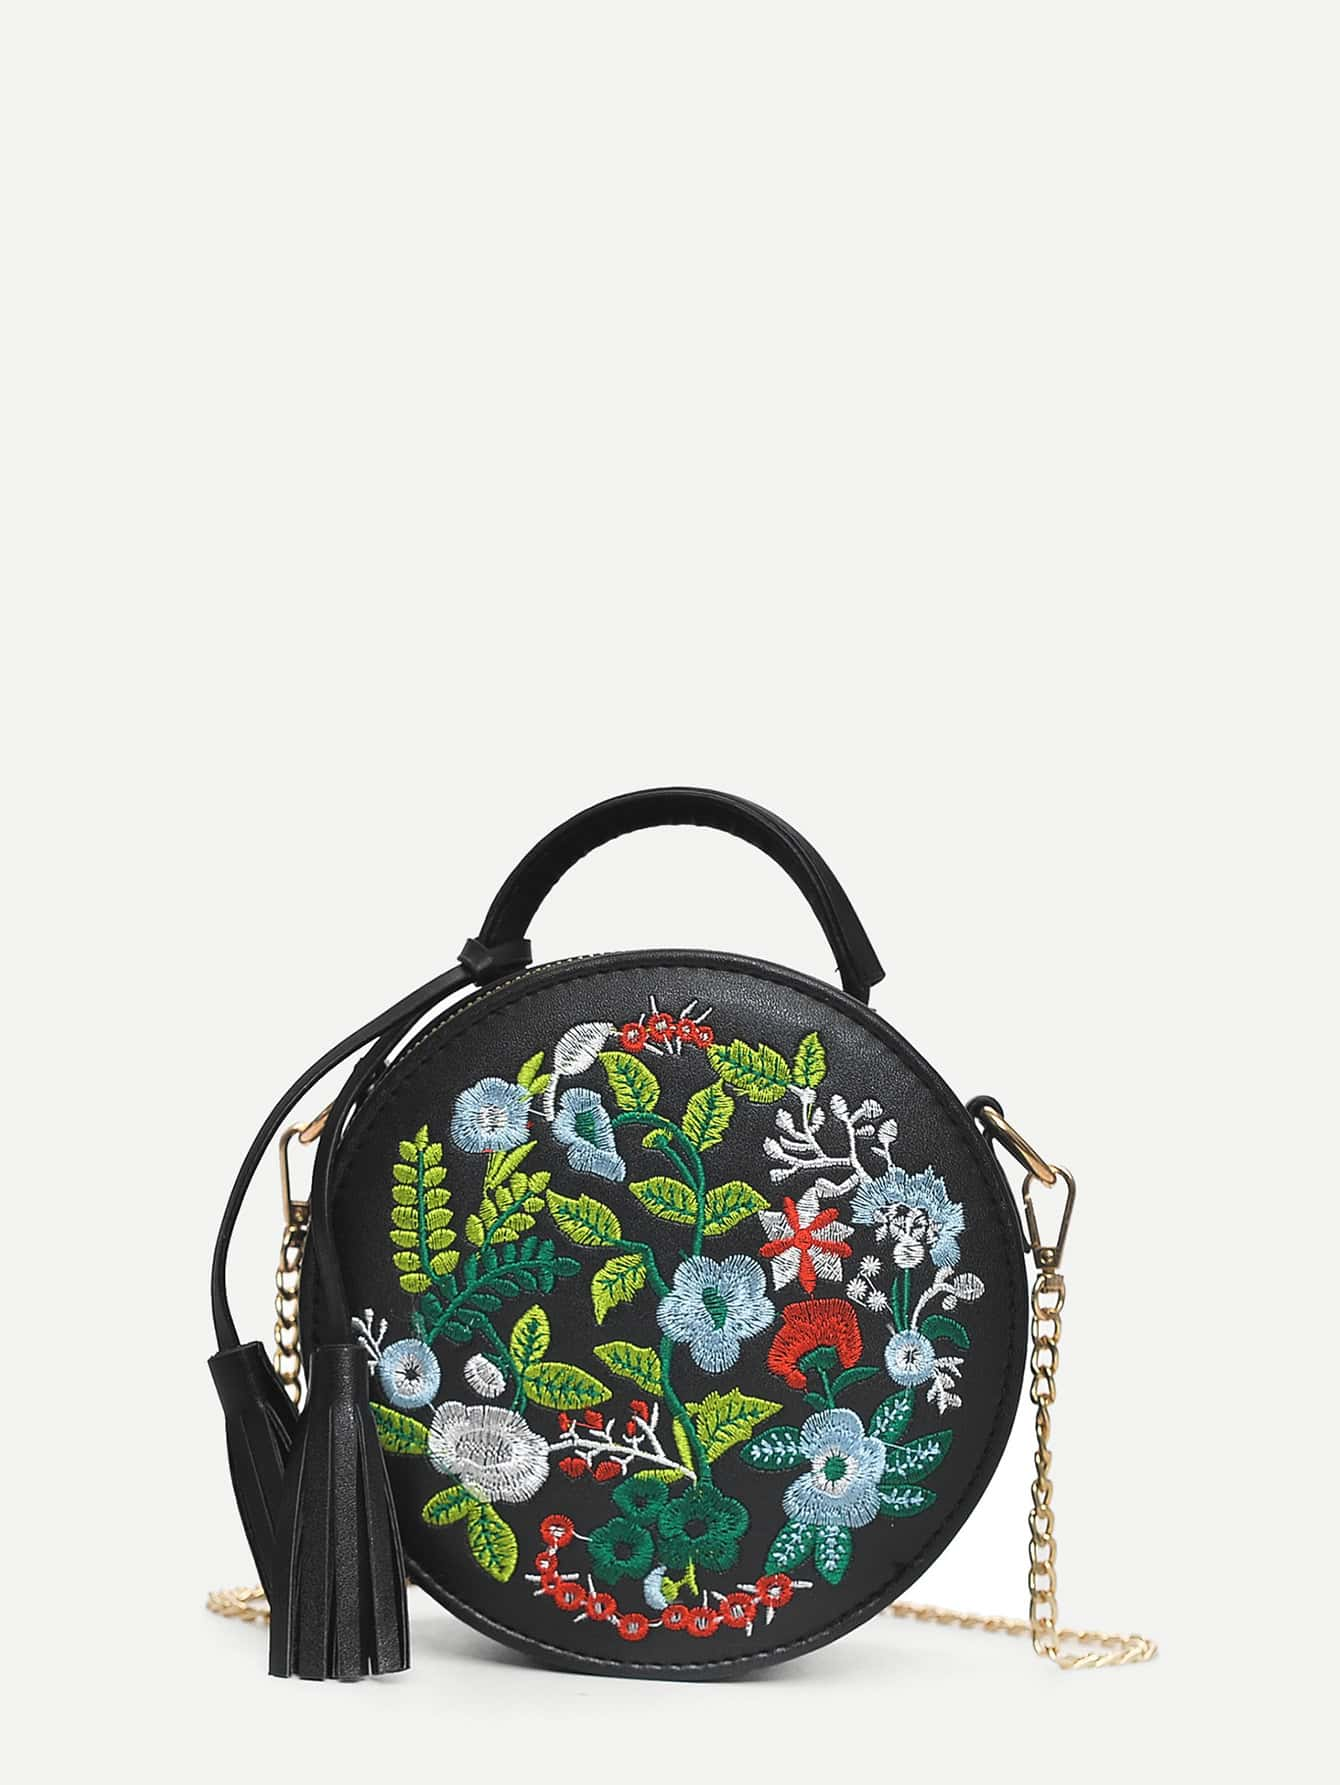 Tassel Decor Floral Embroidered Crossbody Bag